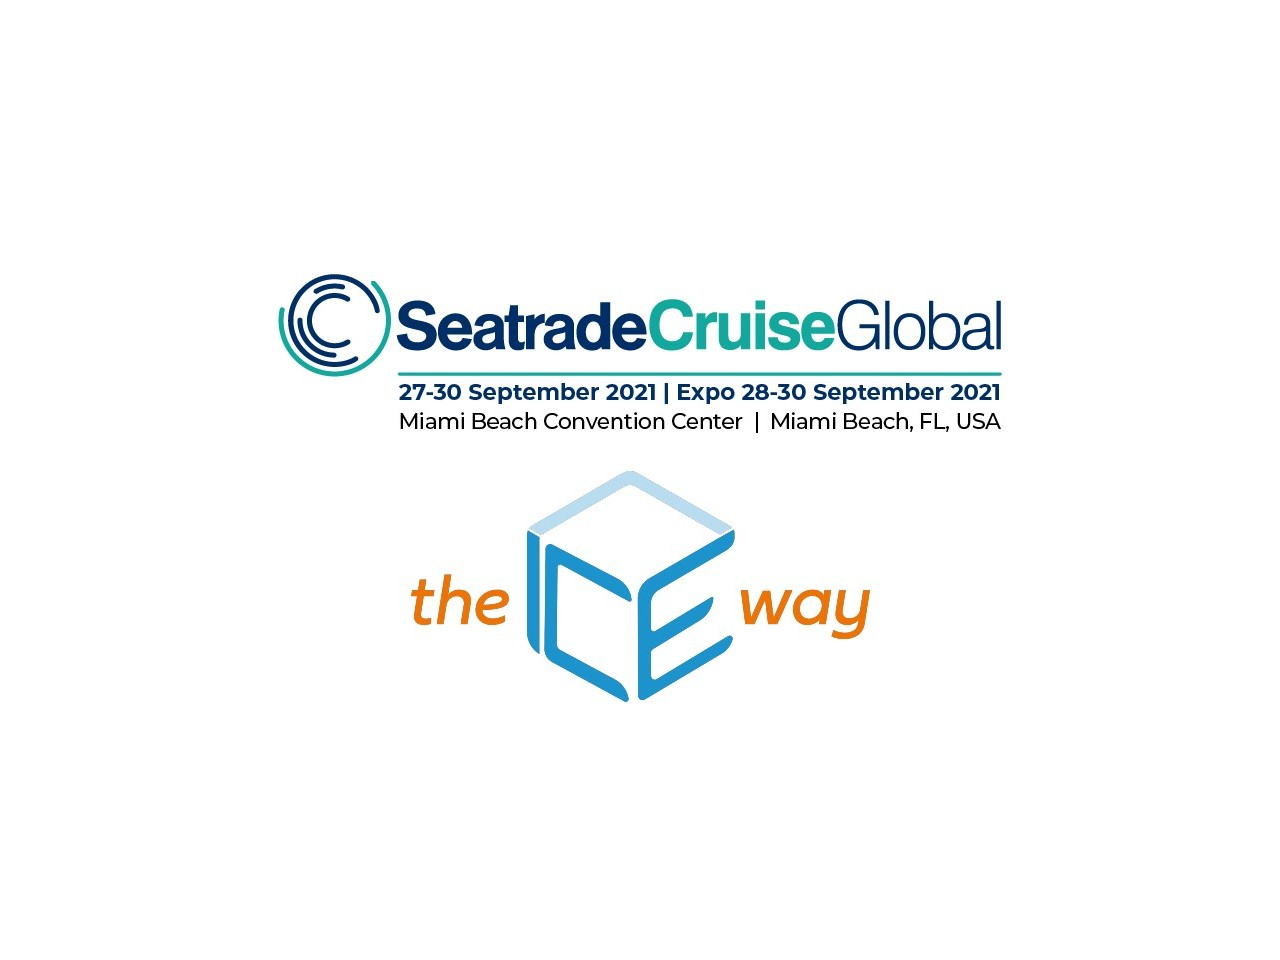 Seatrade Cruise Global Sep 2021 – 12 days left